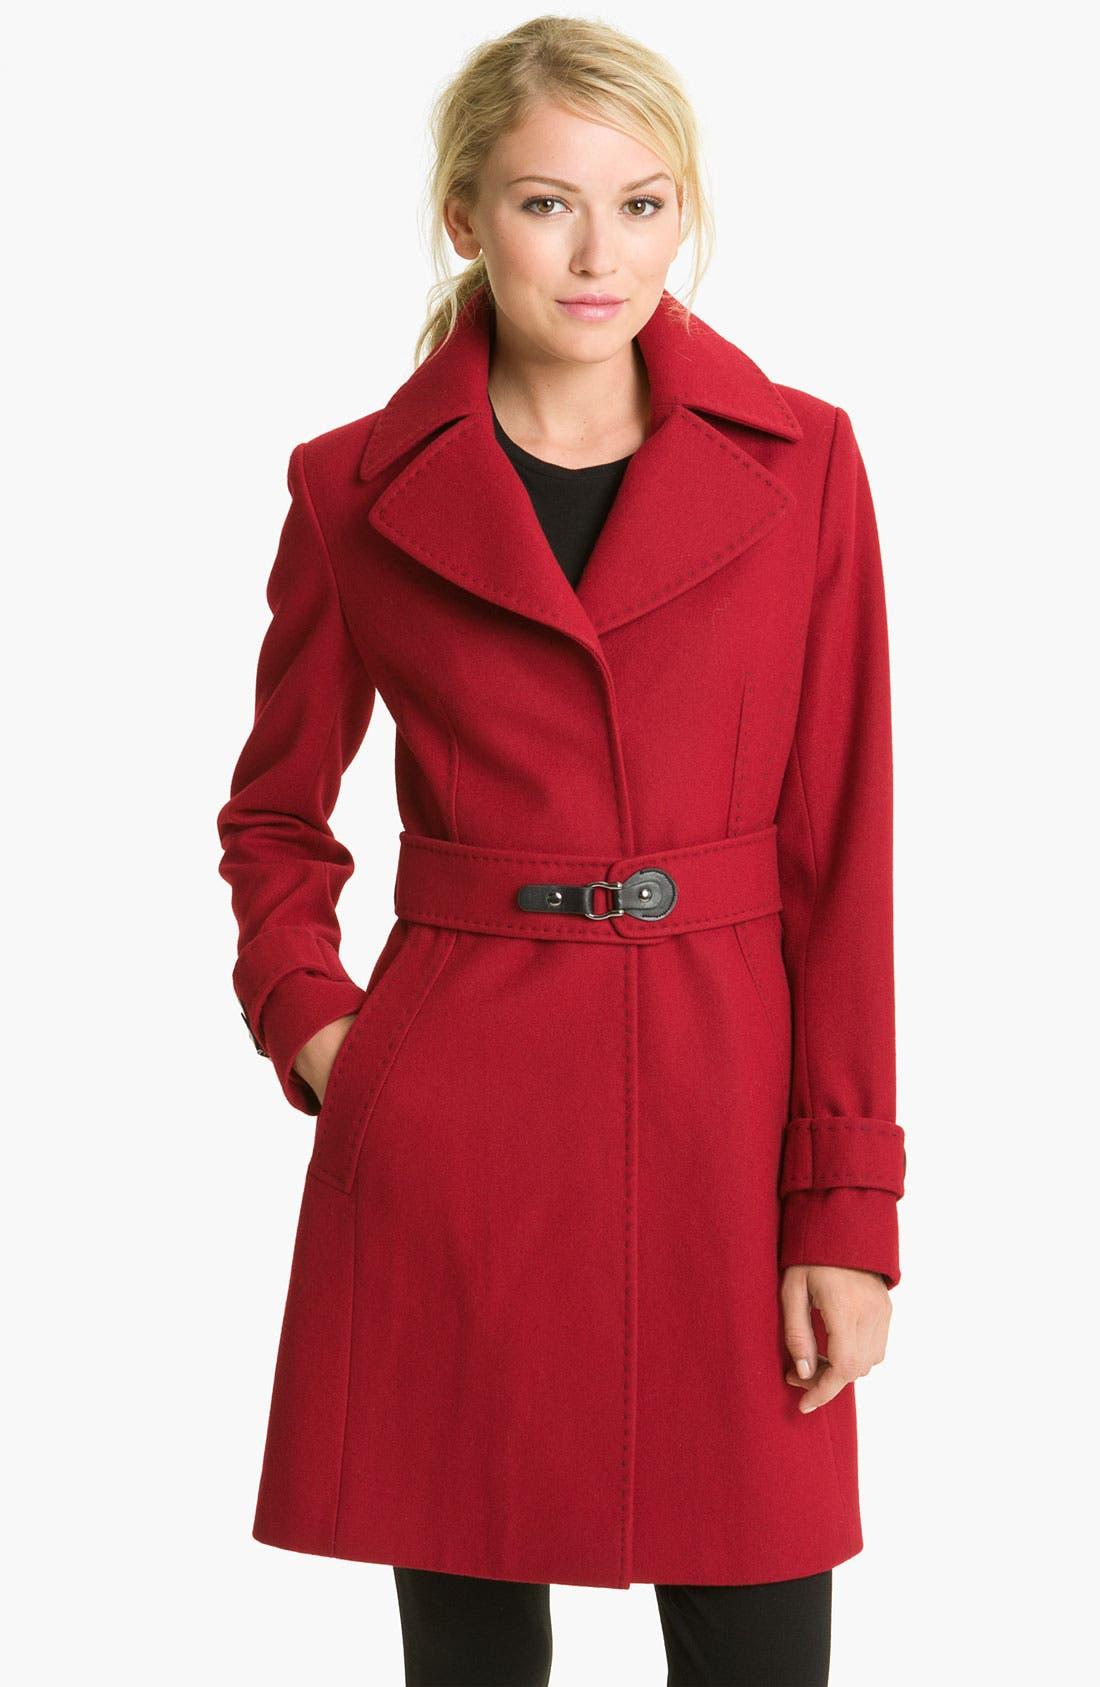 Alternate Image 1 Selected - Via Spiga 'Dora' Pickstitch Detail Wool Blend Coat